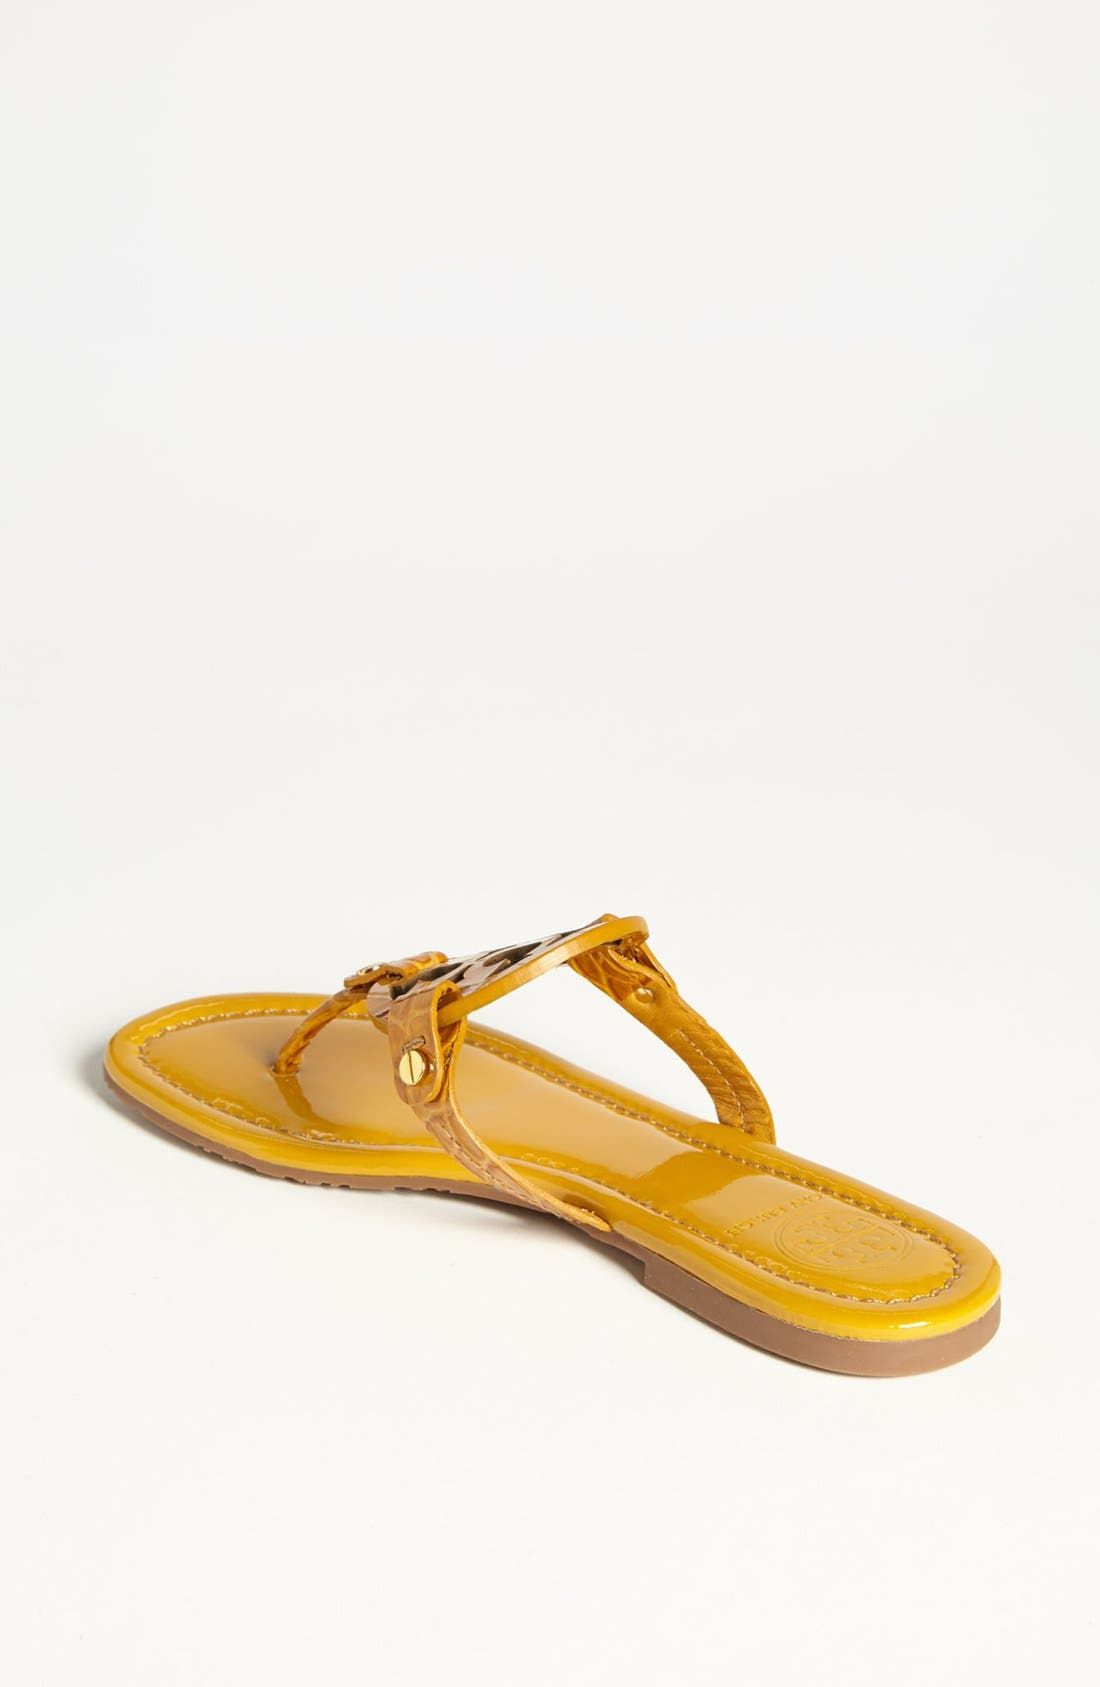 Alternate Image 3  - Tory Burch 'Miller' Croc Embossed Sandal (Online Only)